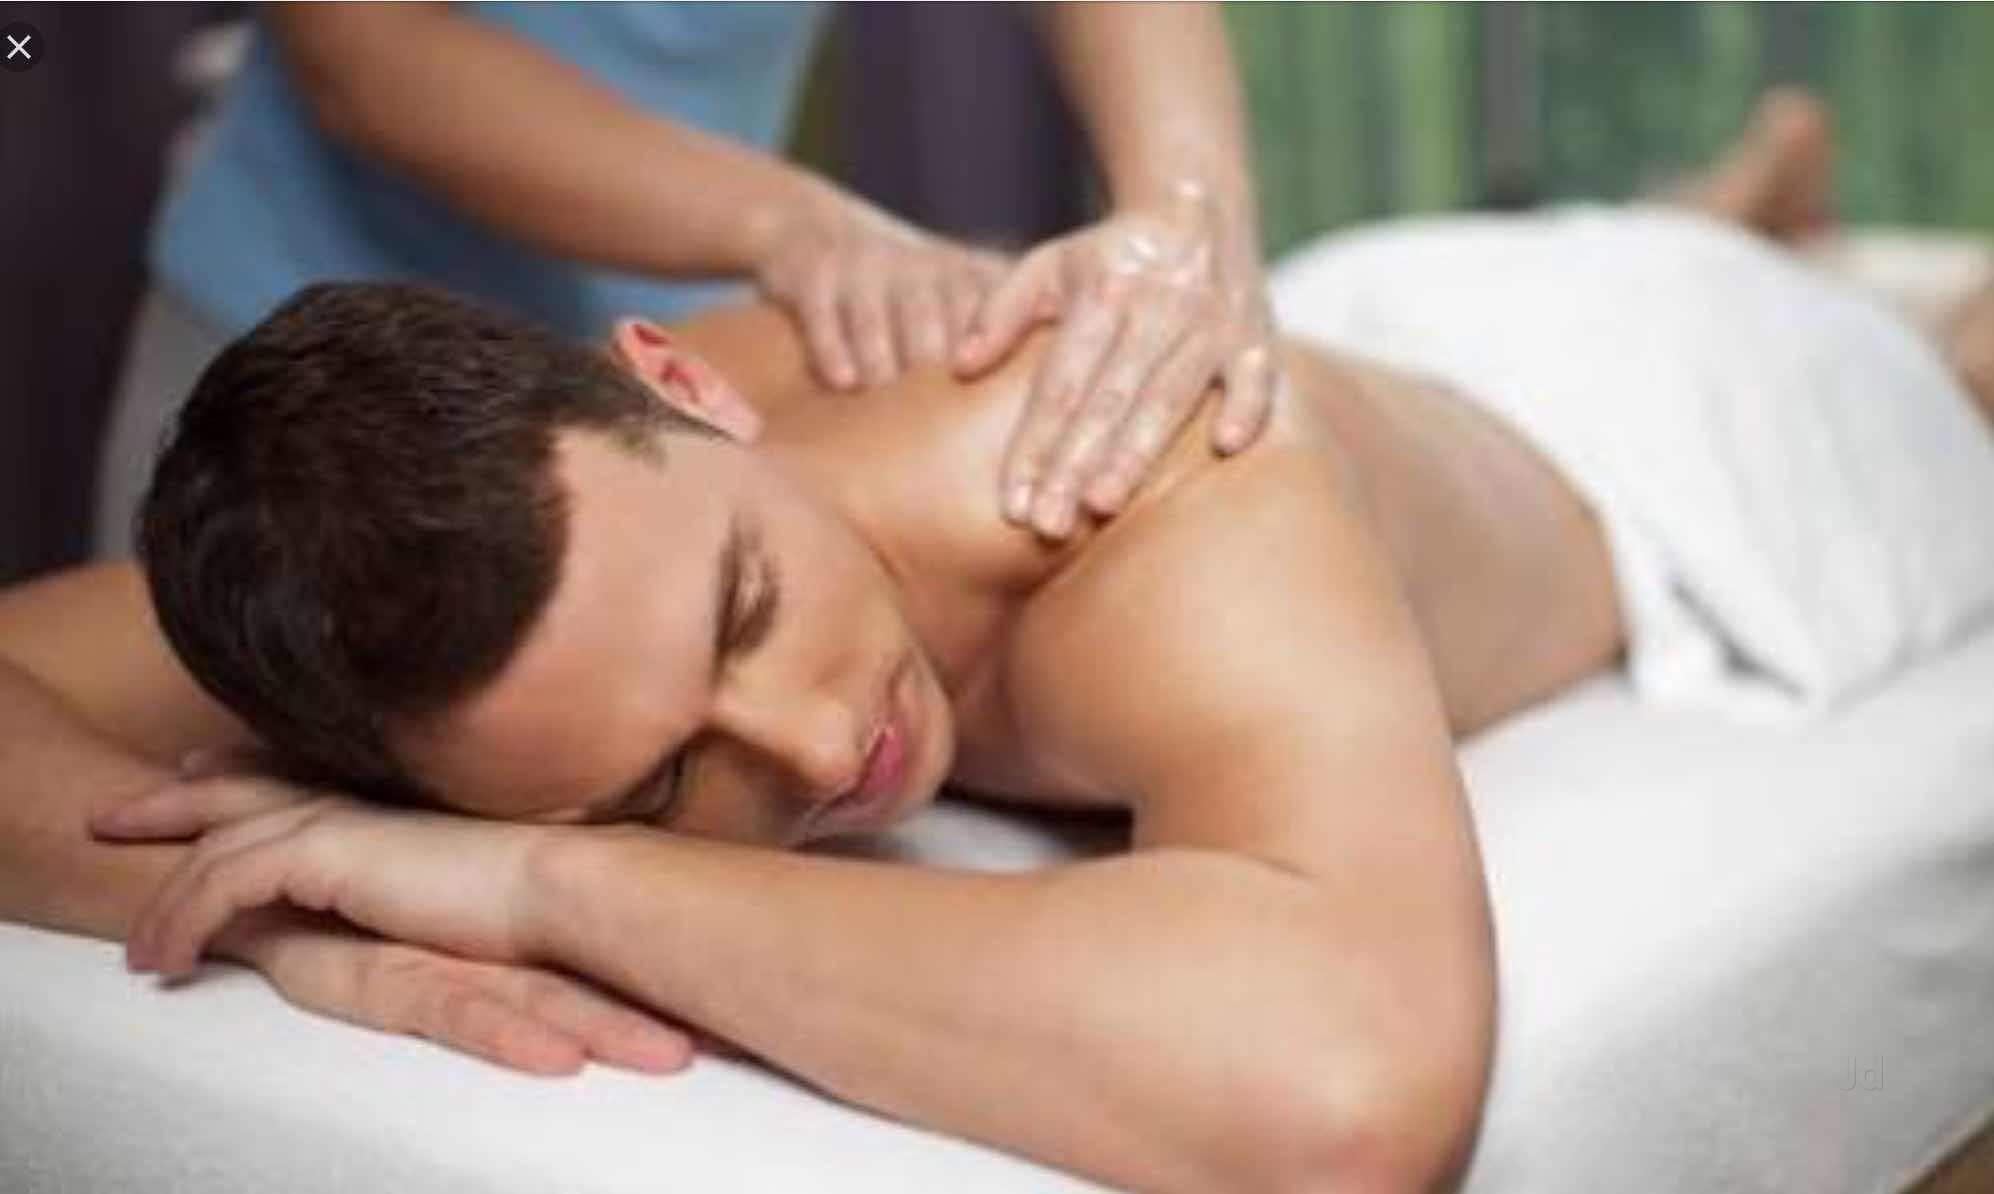 Men massage Nude Photos 96